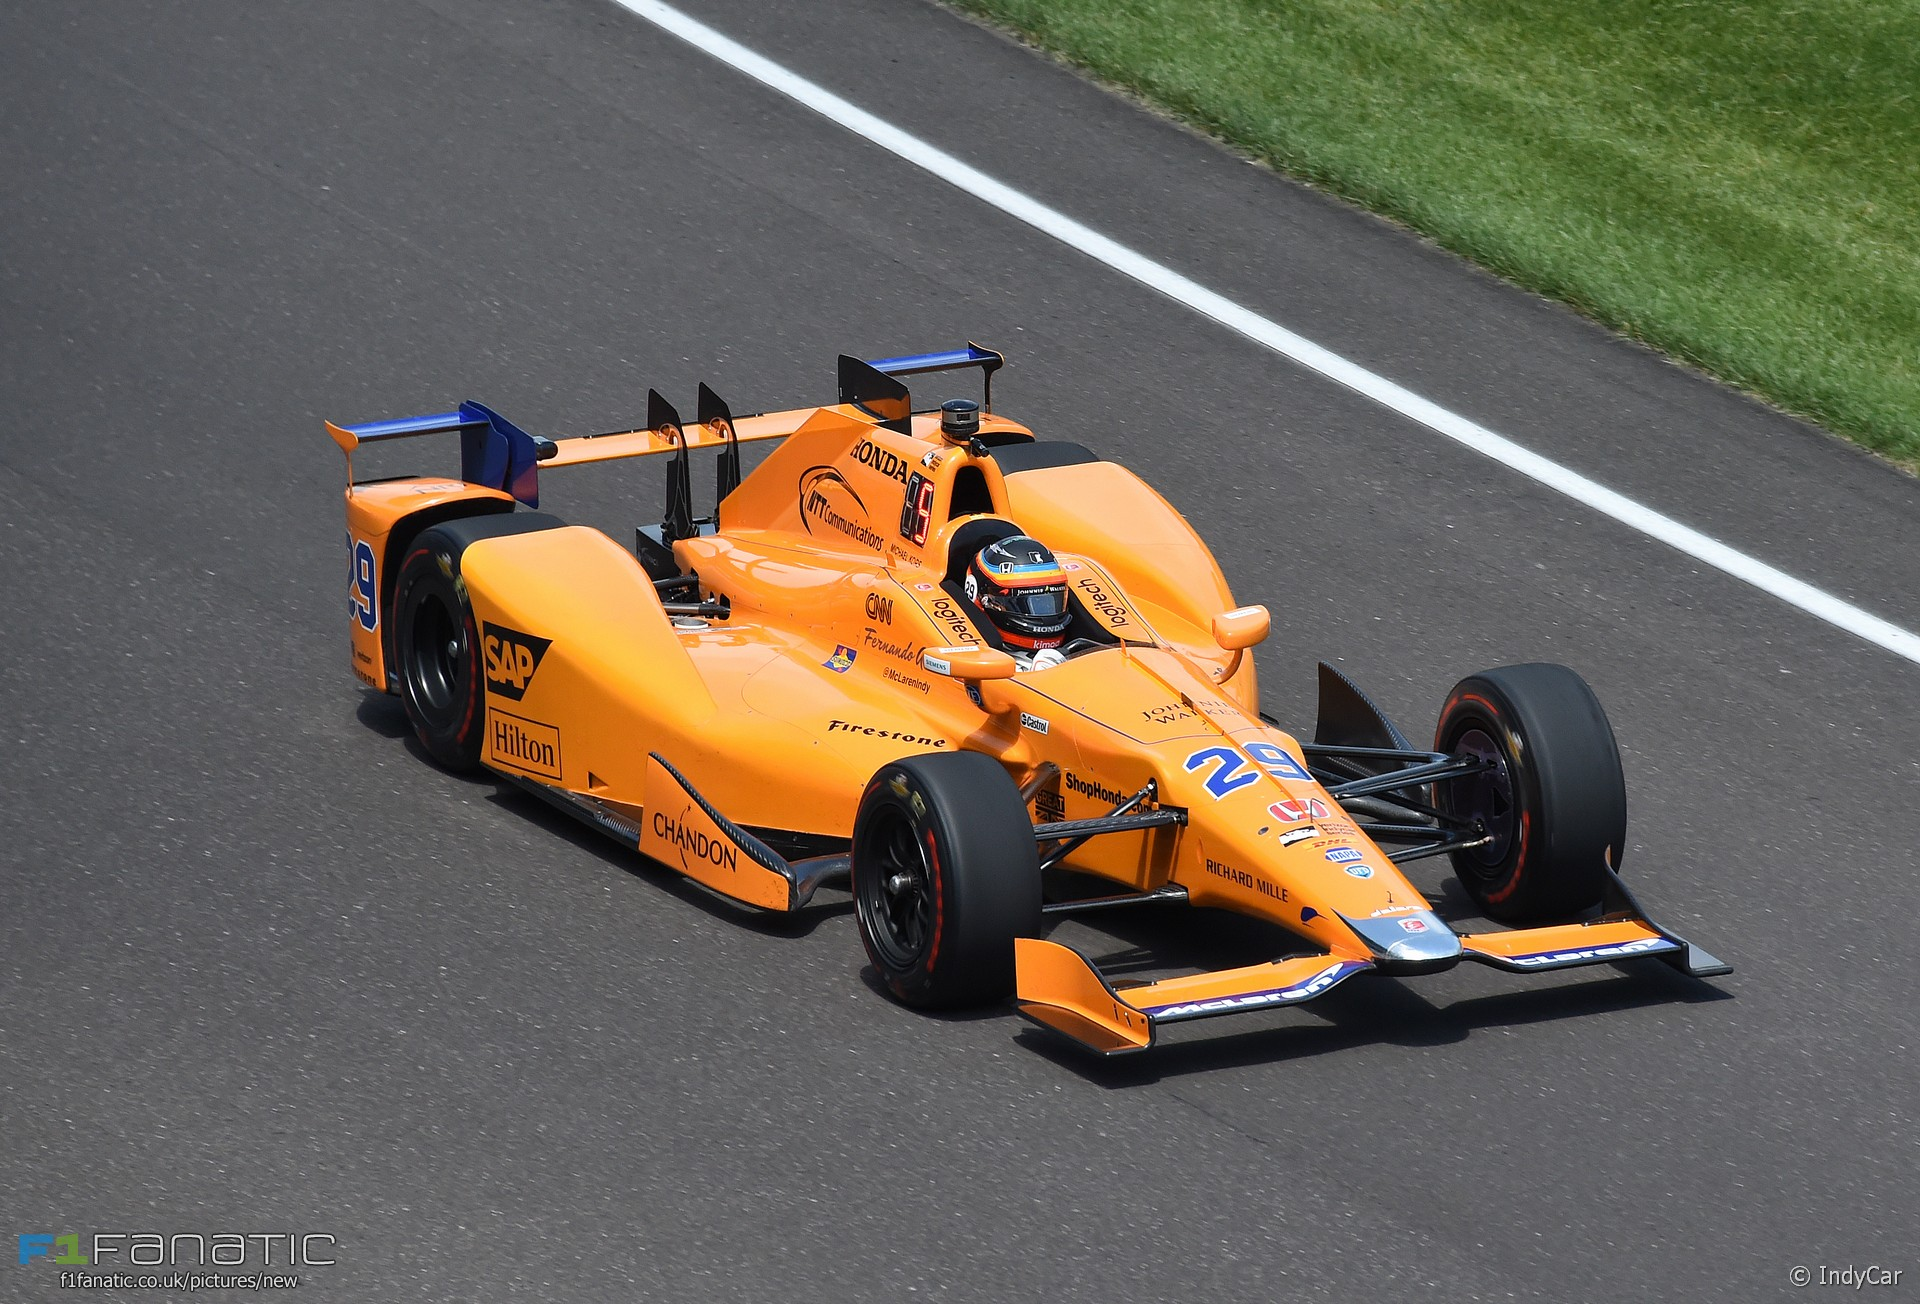 Fernando Alonso, McLaren Andretti, IndyCar, Indianapolis Motor Speedway, 2017 · F1 Fanatic